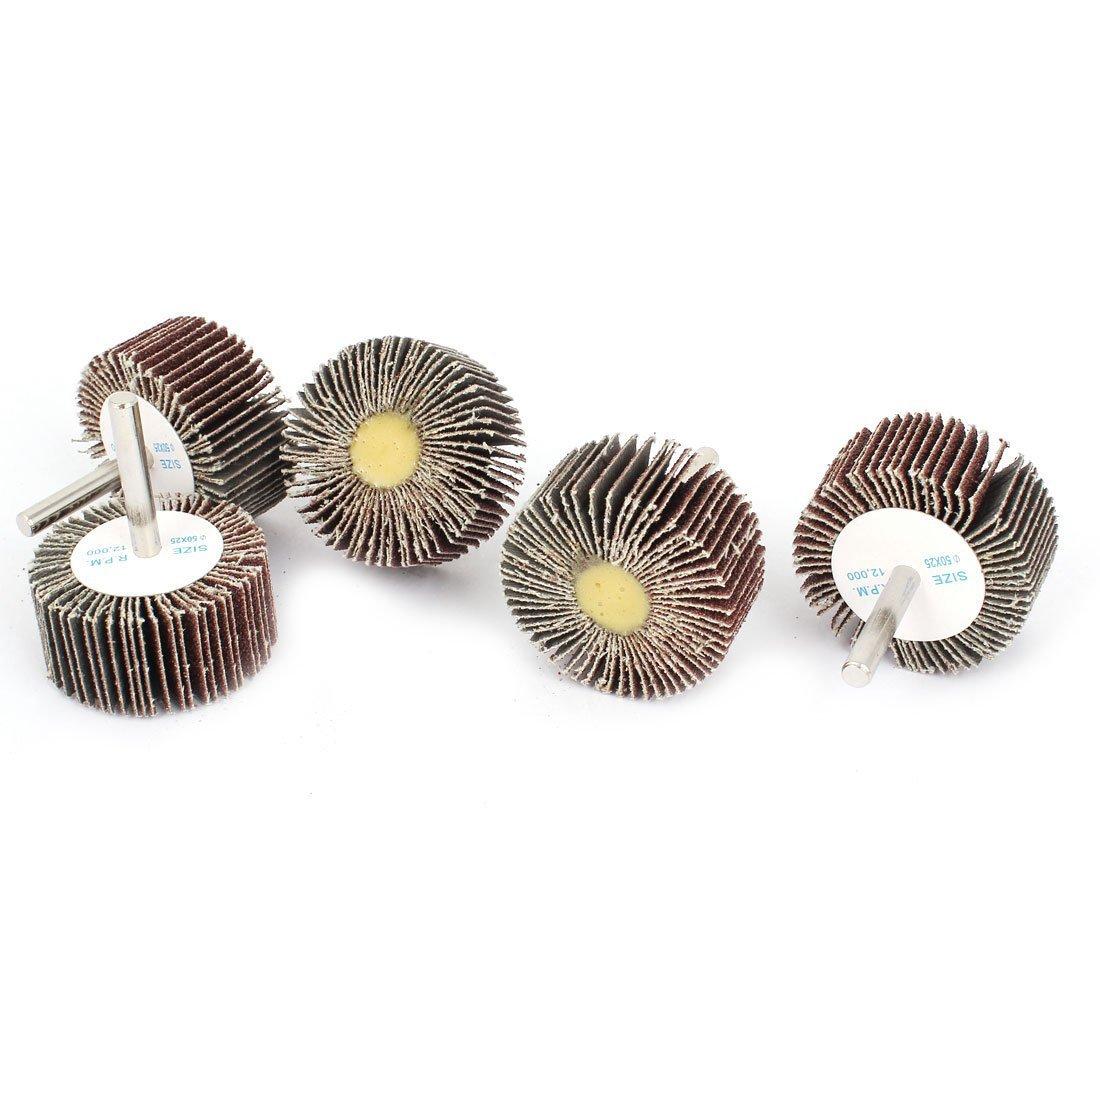 50mm x 25mm x 6mm 80 Grit Fixed Shaft Grinding Flap Wheel Discs 5pcs a14112100ux0419